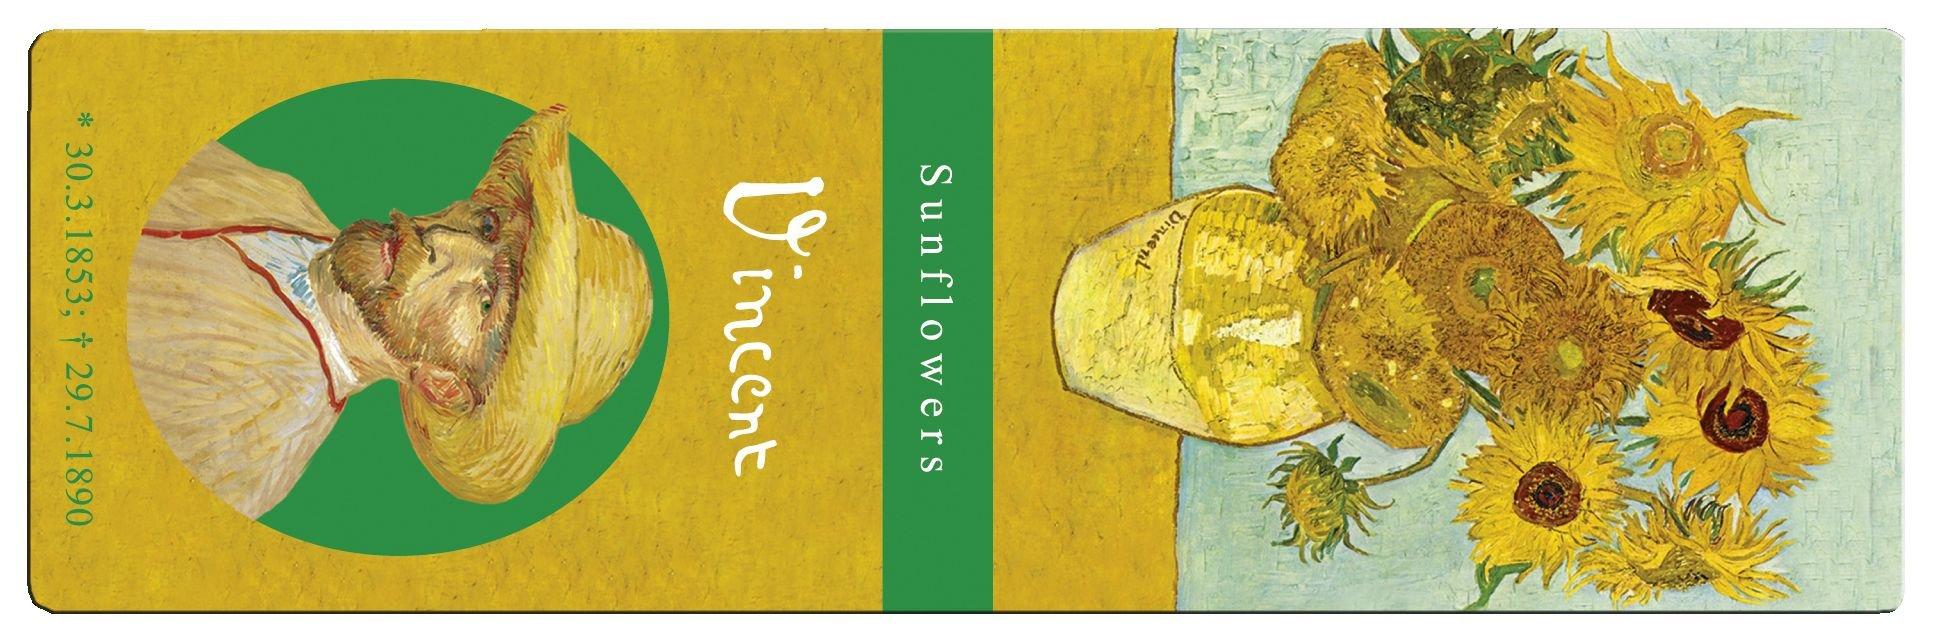 Zakladka do ksiazek Vincent Van Gogh